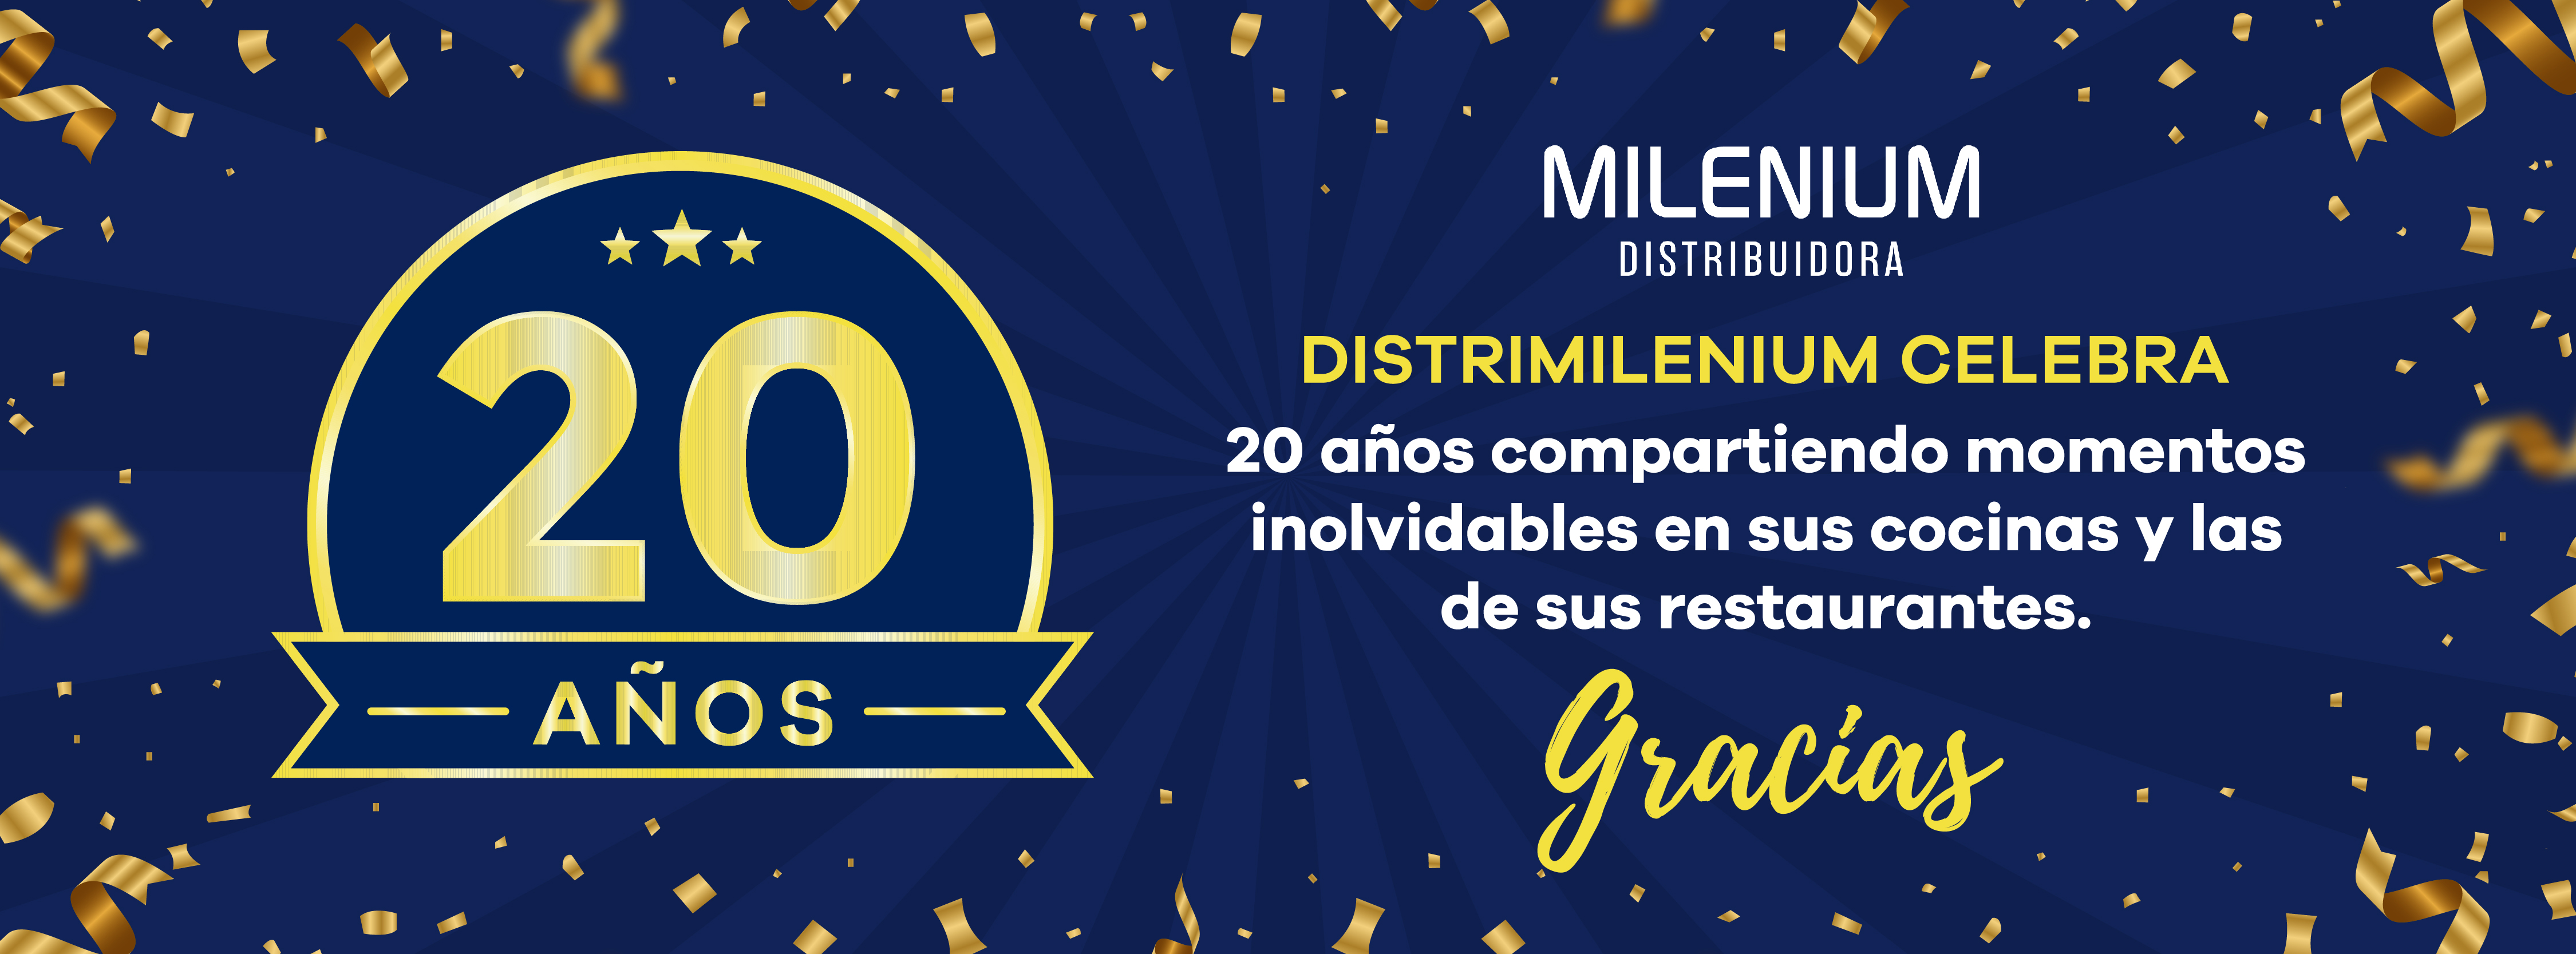 banners_milenium_20_años-04